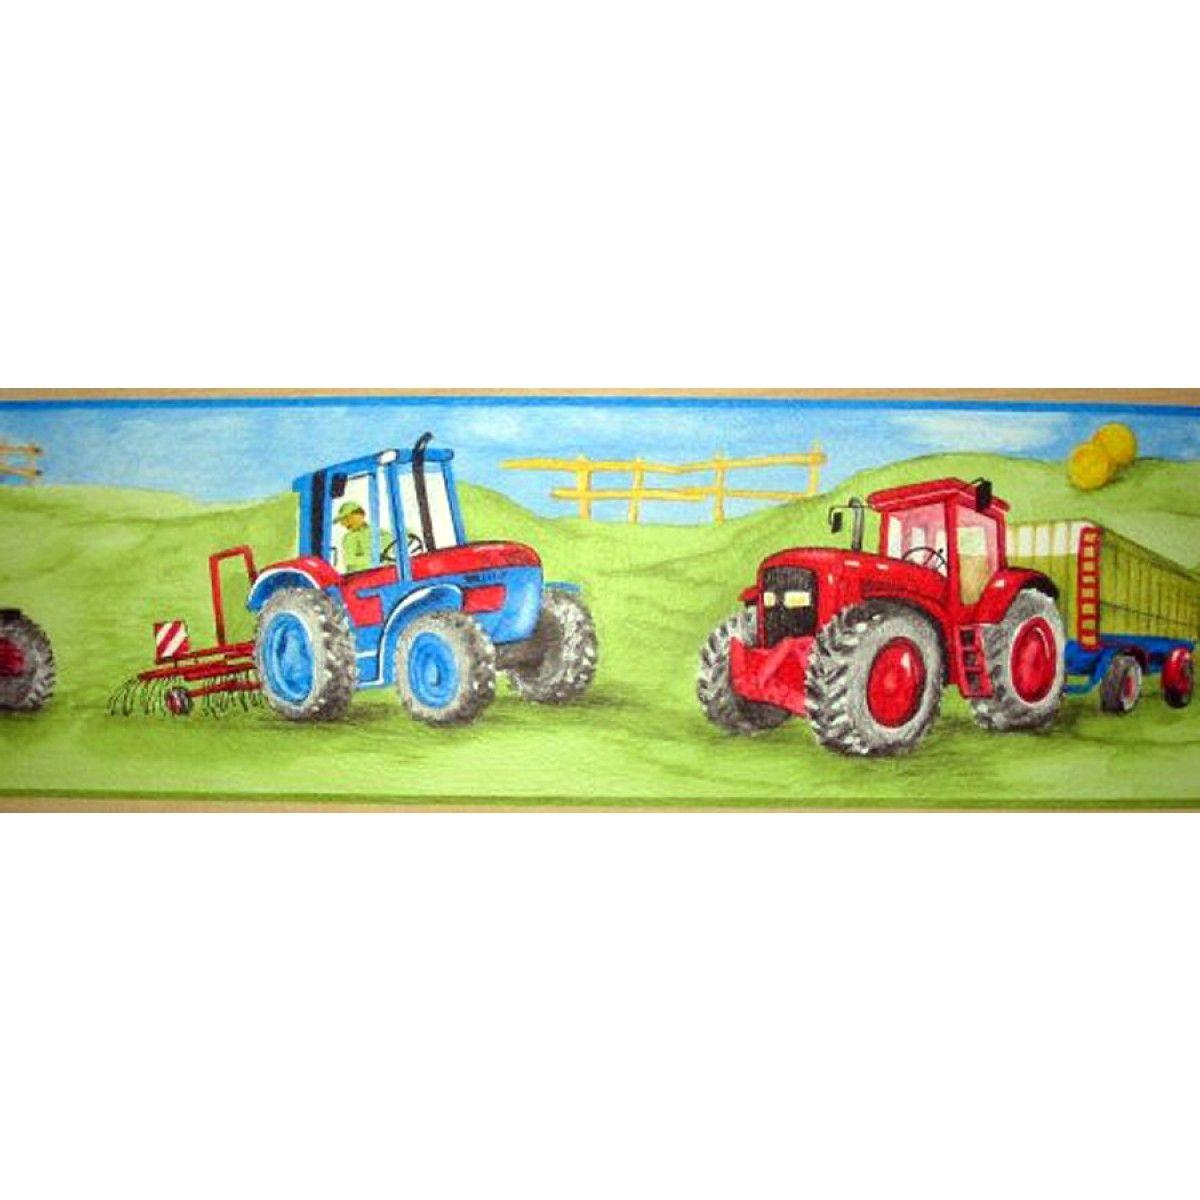 Tractor Green Wallpaper Border 5m Wallpaper Border Green